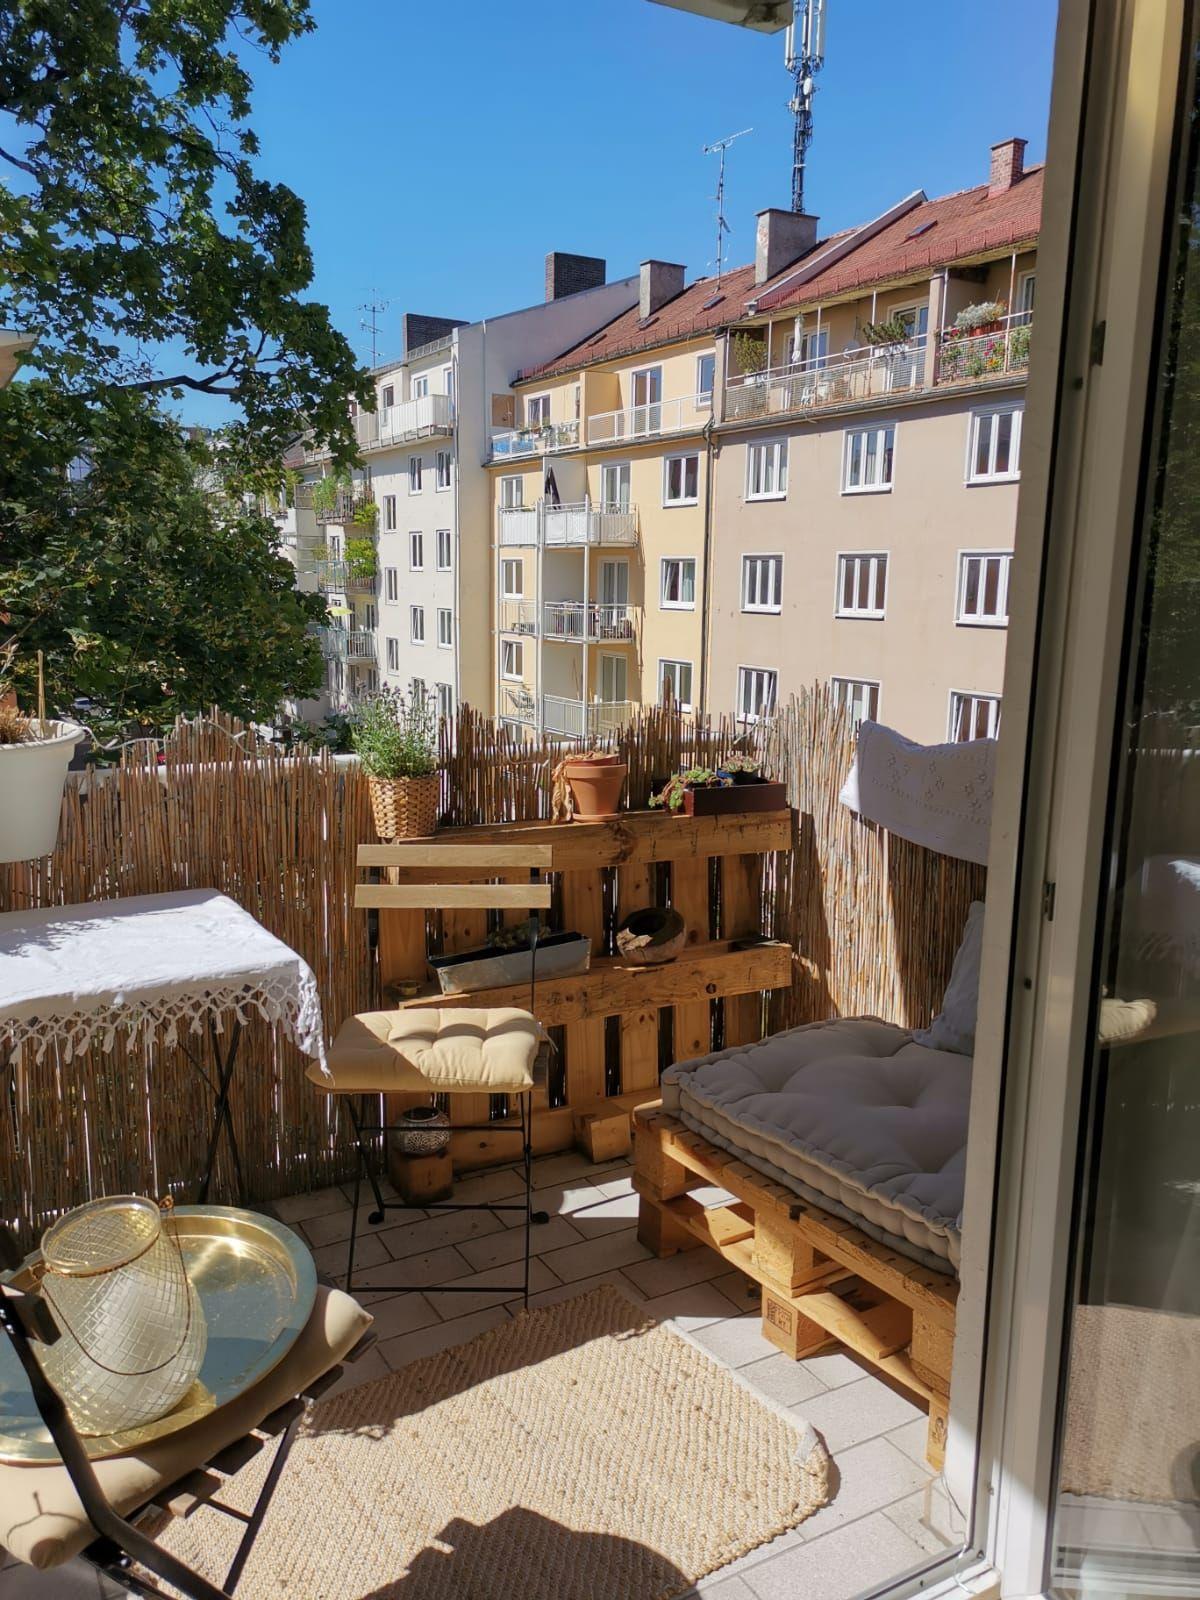 DIY Balkonmöbel   Balkonmöbel, Wohnung balkon dekoration, Zuhause ...